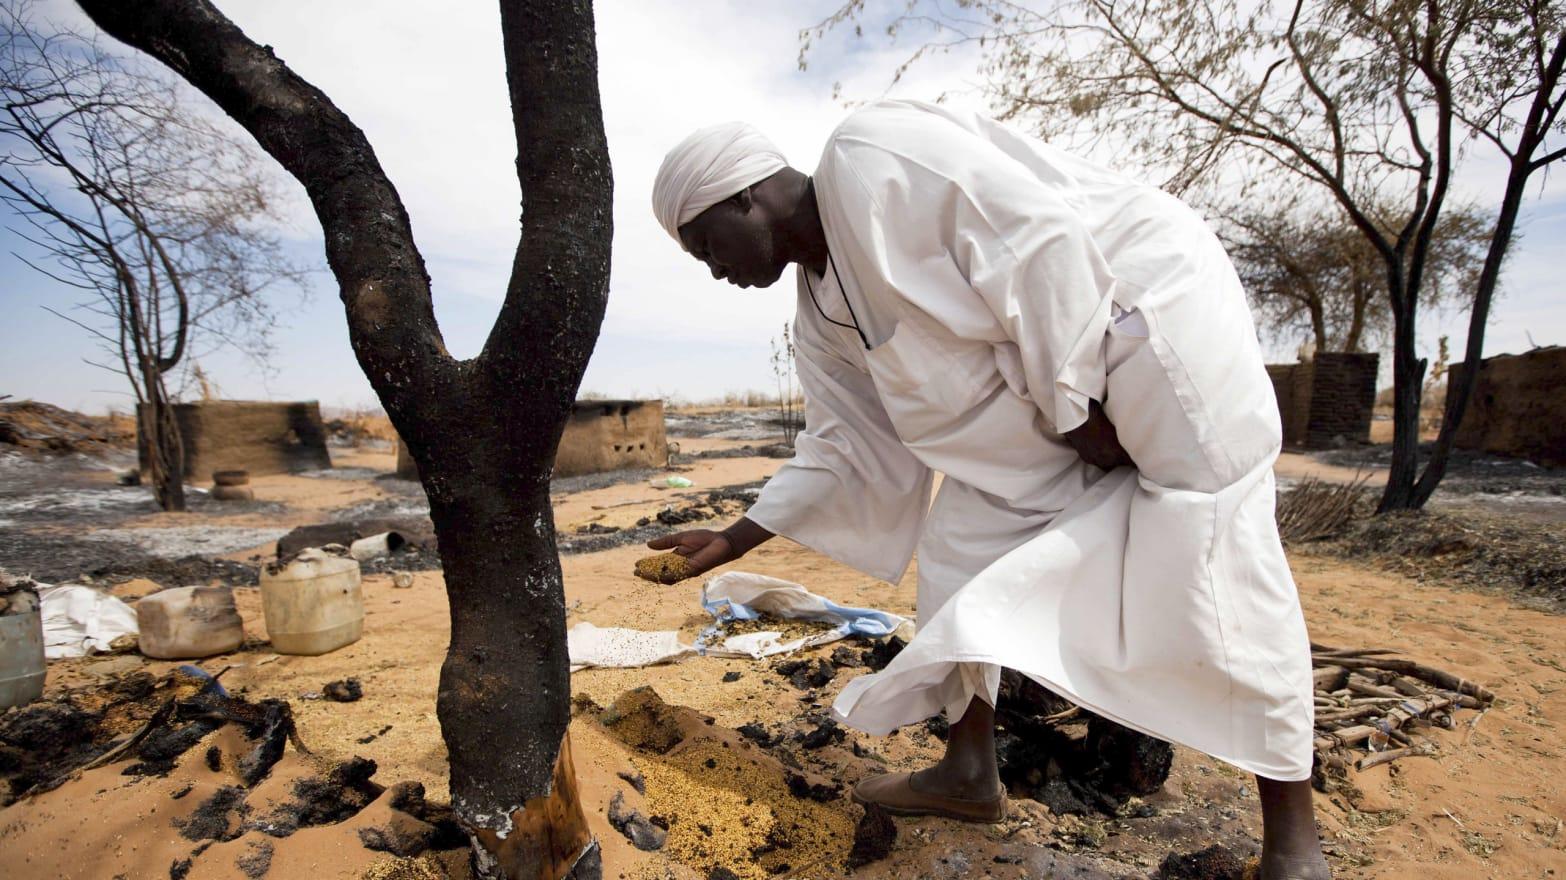 Darfur, Anche Senza Bashir Violenze Continuano: Almeno 14 Vittime